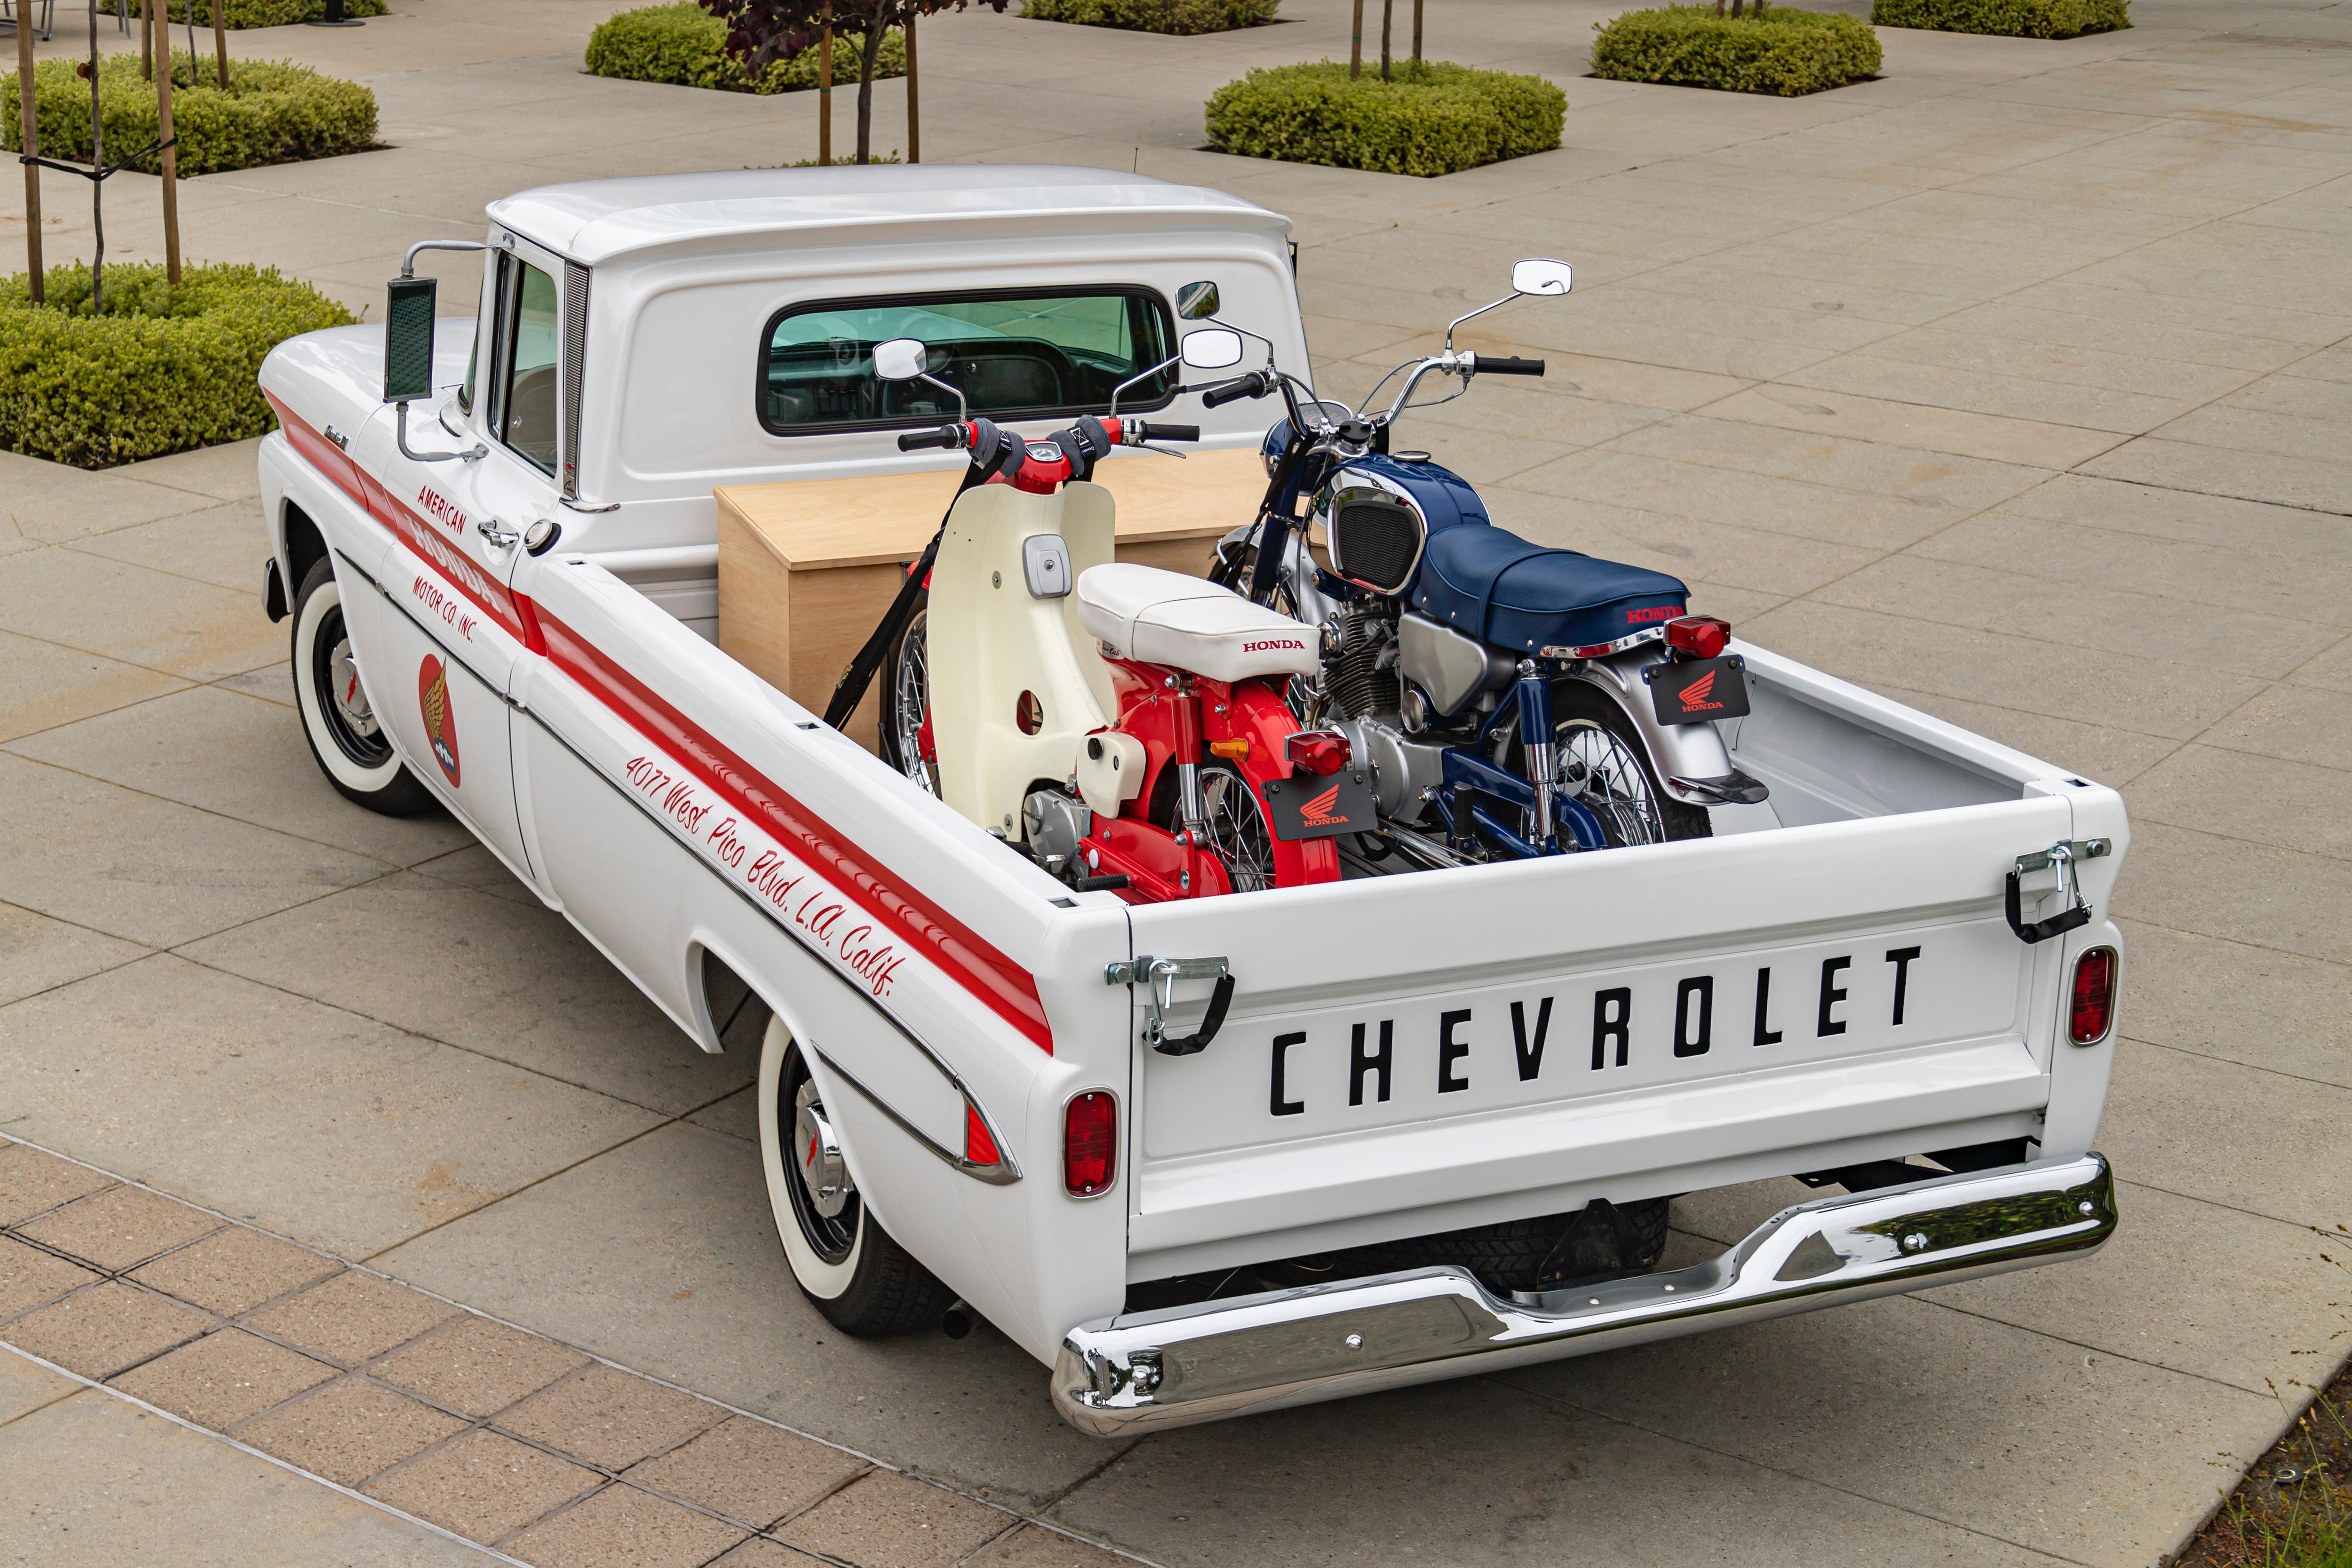 Chevrolet truck, Why did American Honda restore a 1961 Chevrolet pickup truck?, ClassicCars.com Journal